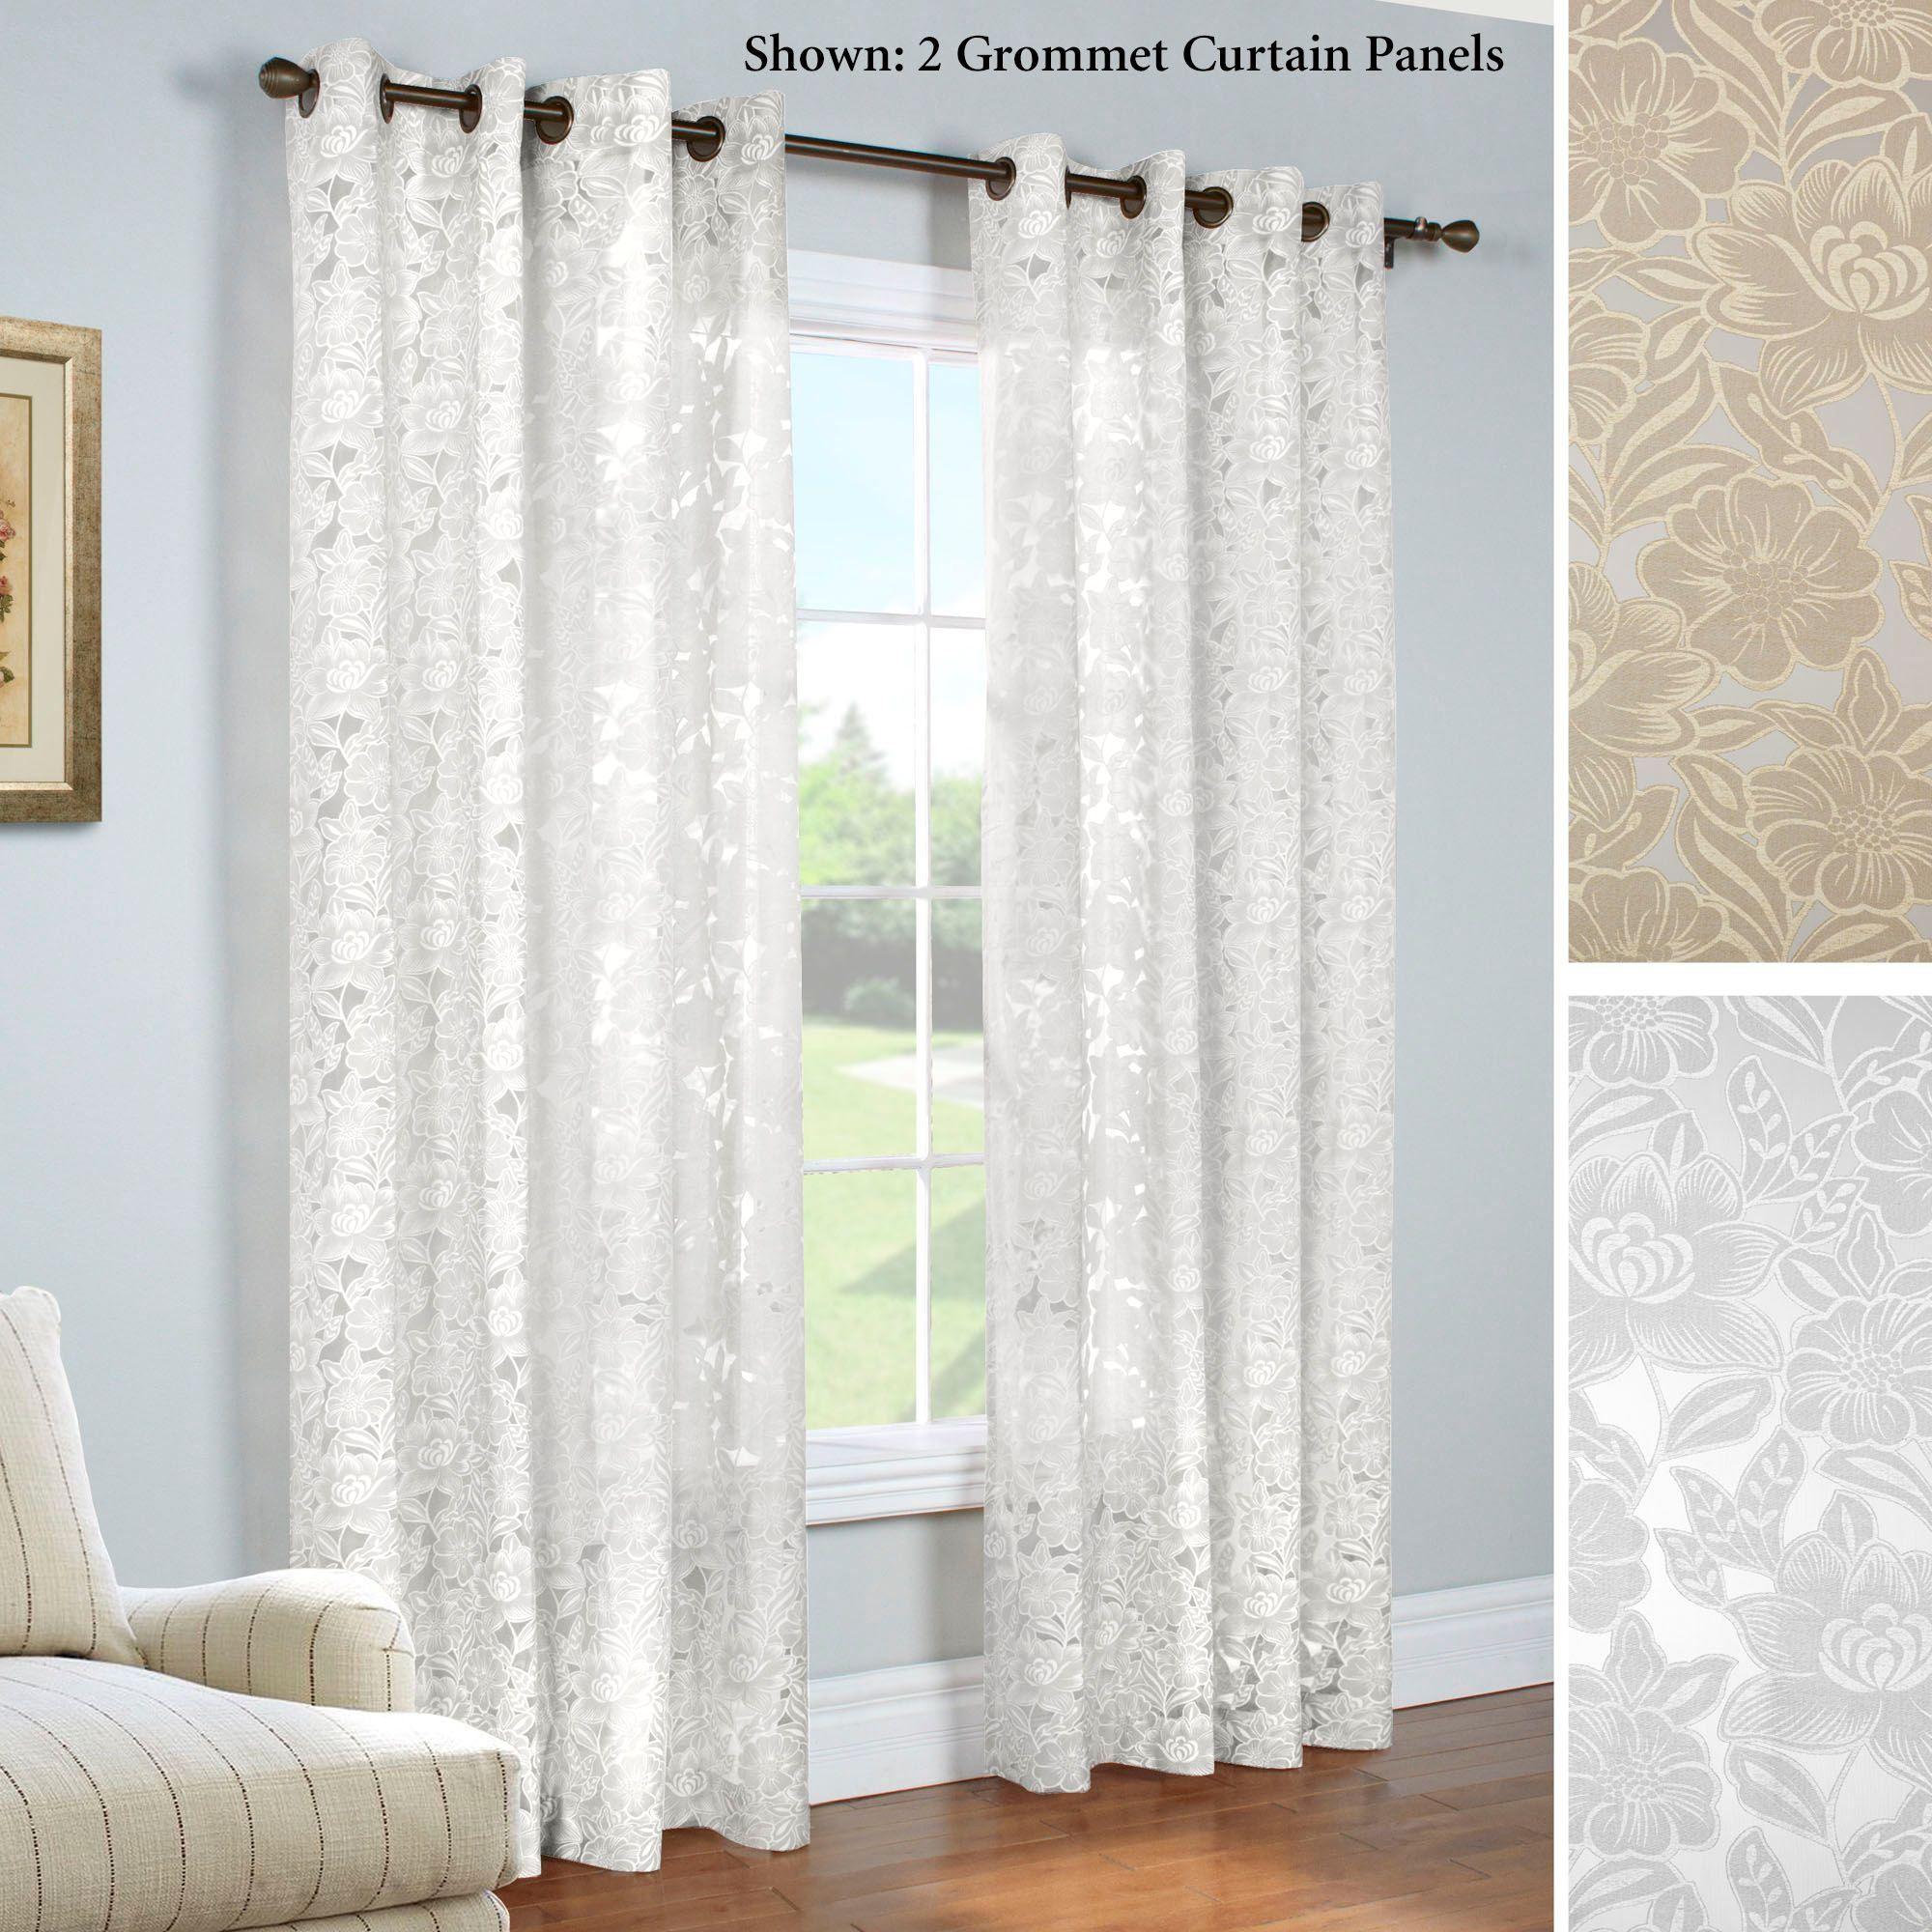 Carlotta Faux Burnout Semi Sheer Grommet Curtain Panels